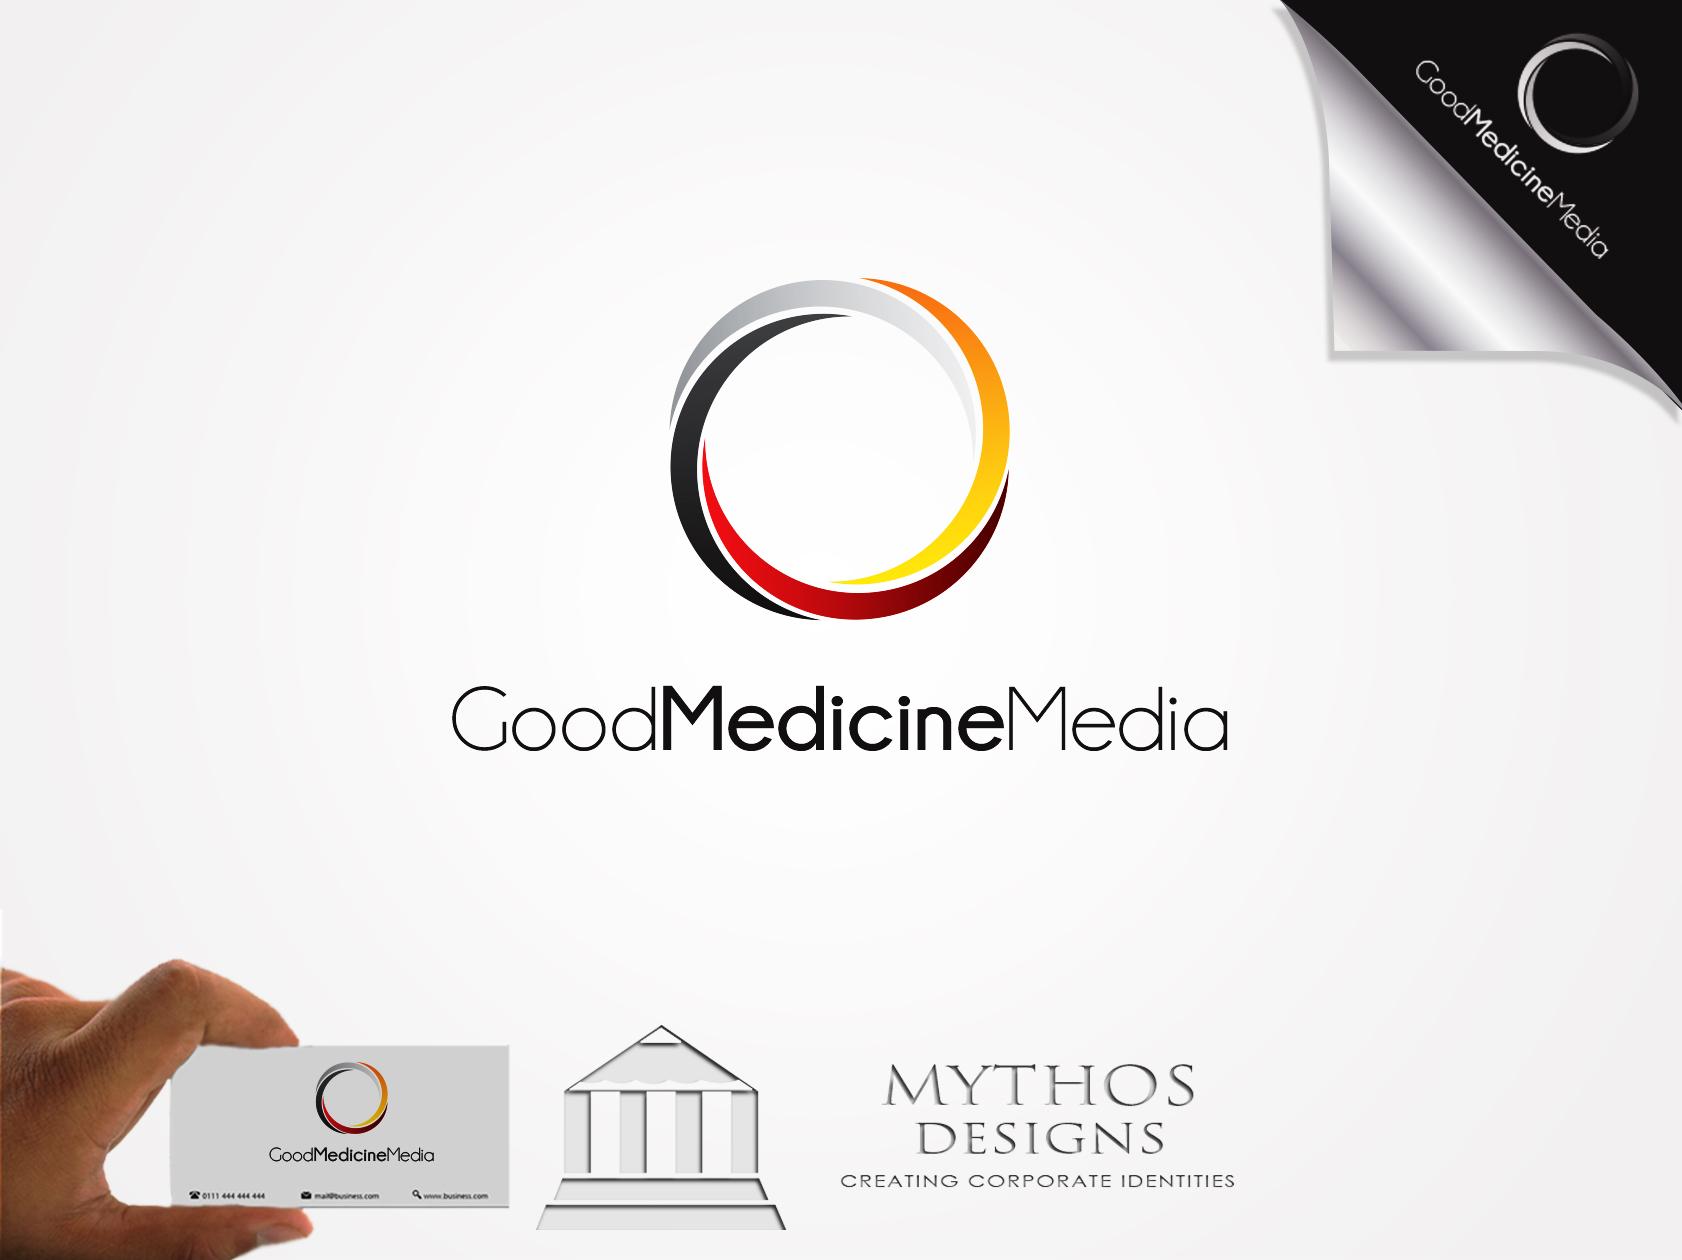 Logo Design by Mythos Designs - Entry No. 171 in the Logo Design Contest Good Medicine Media Logo Design.